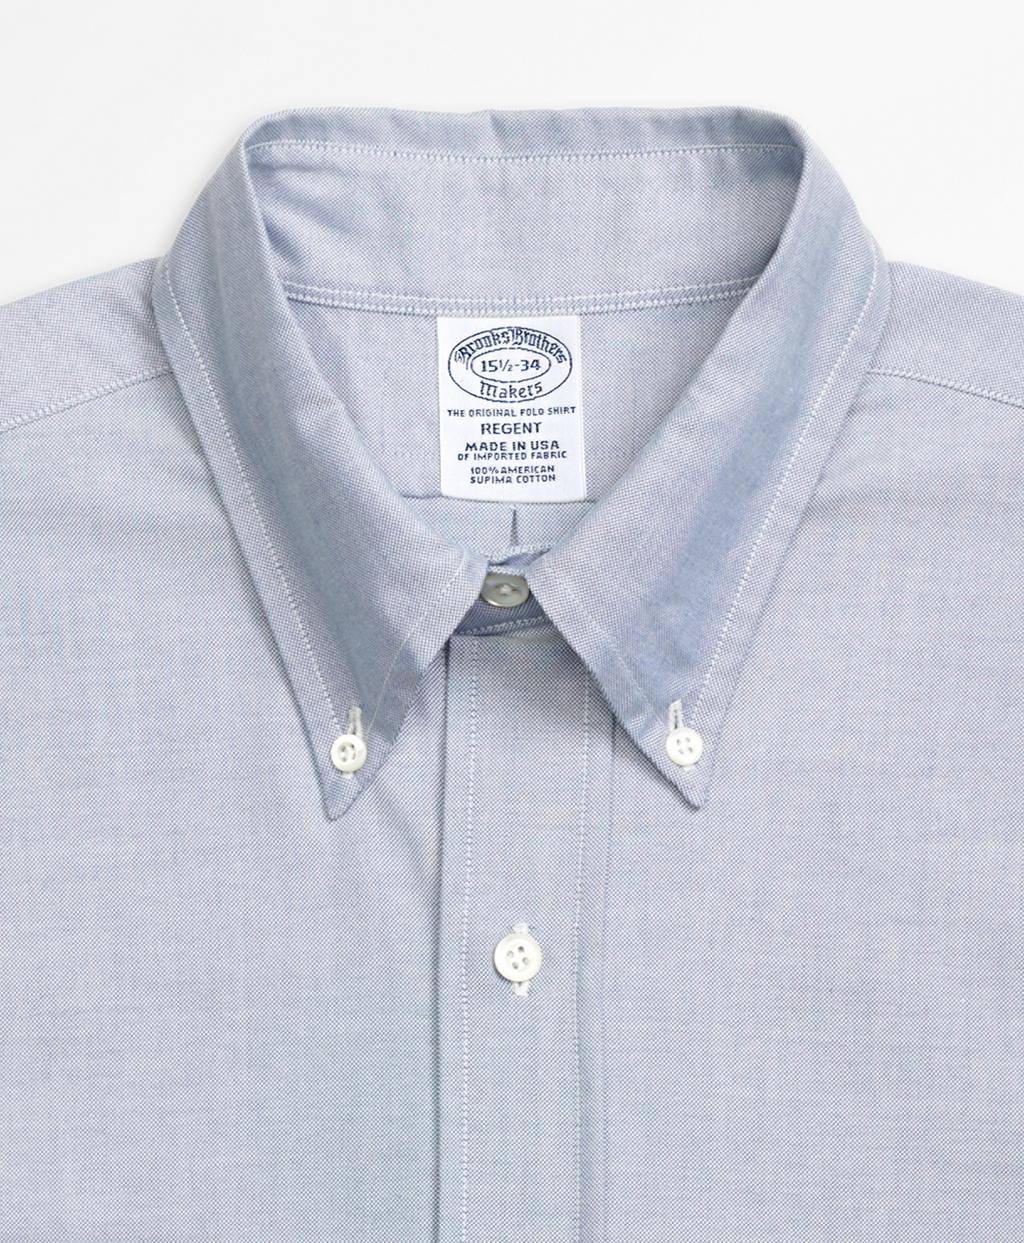 Original Polo Button Down Oxford Regent Fitted Dress Shirt Brooks